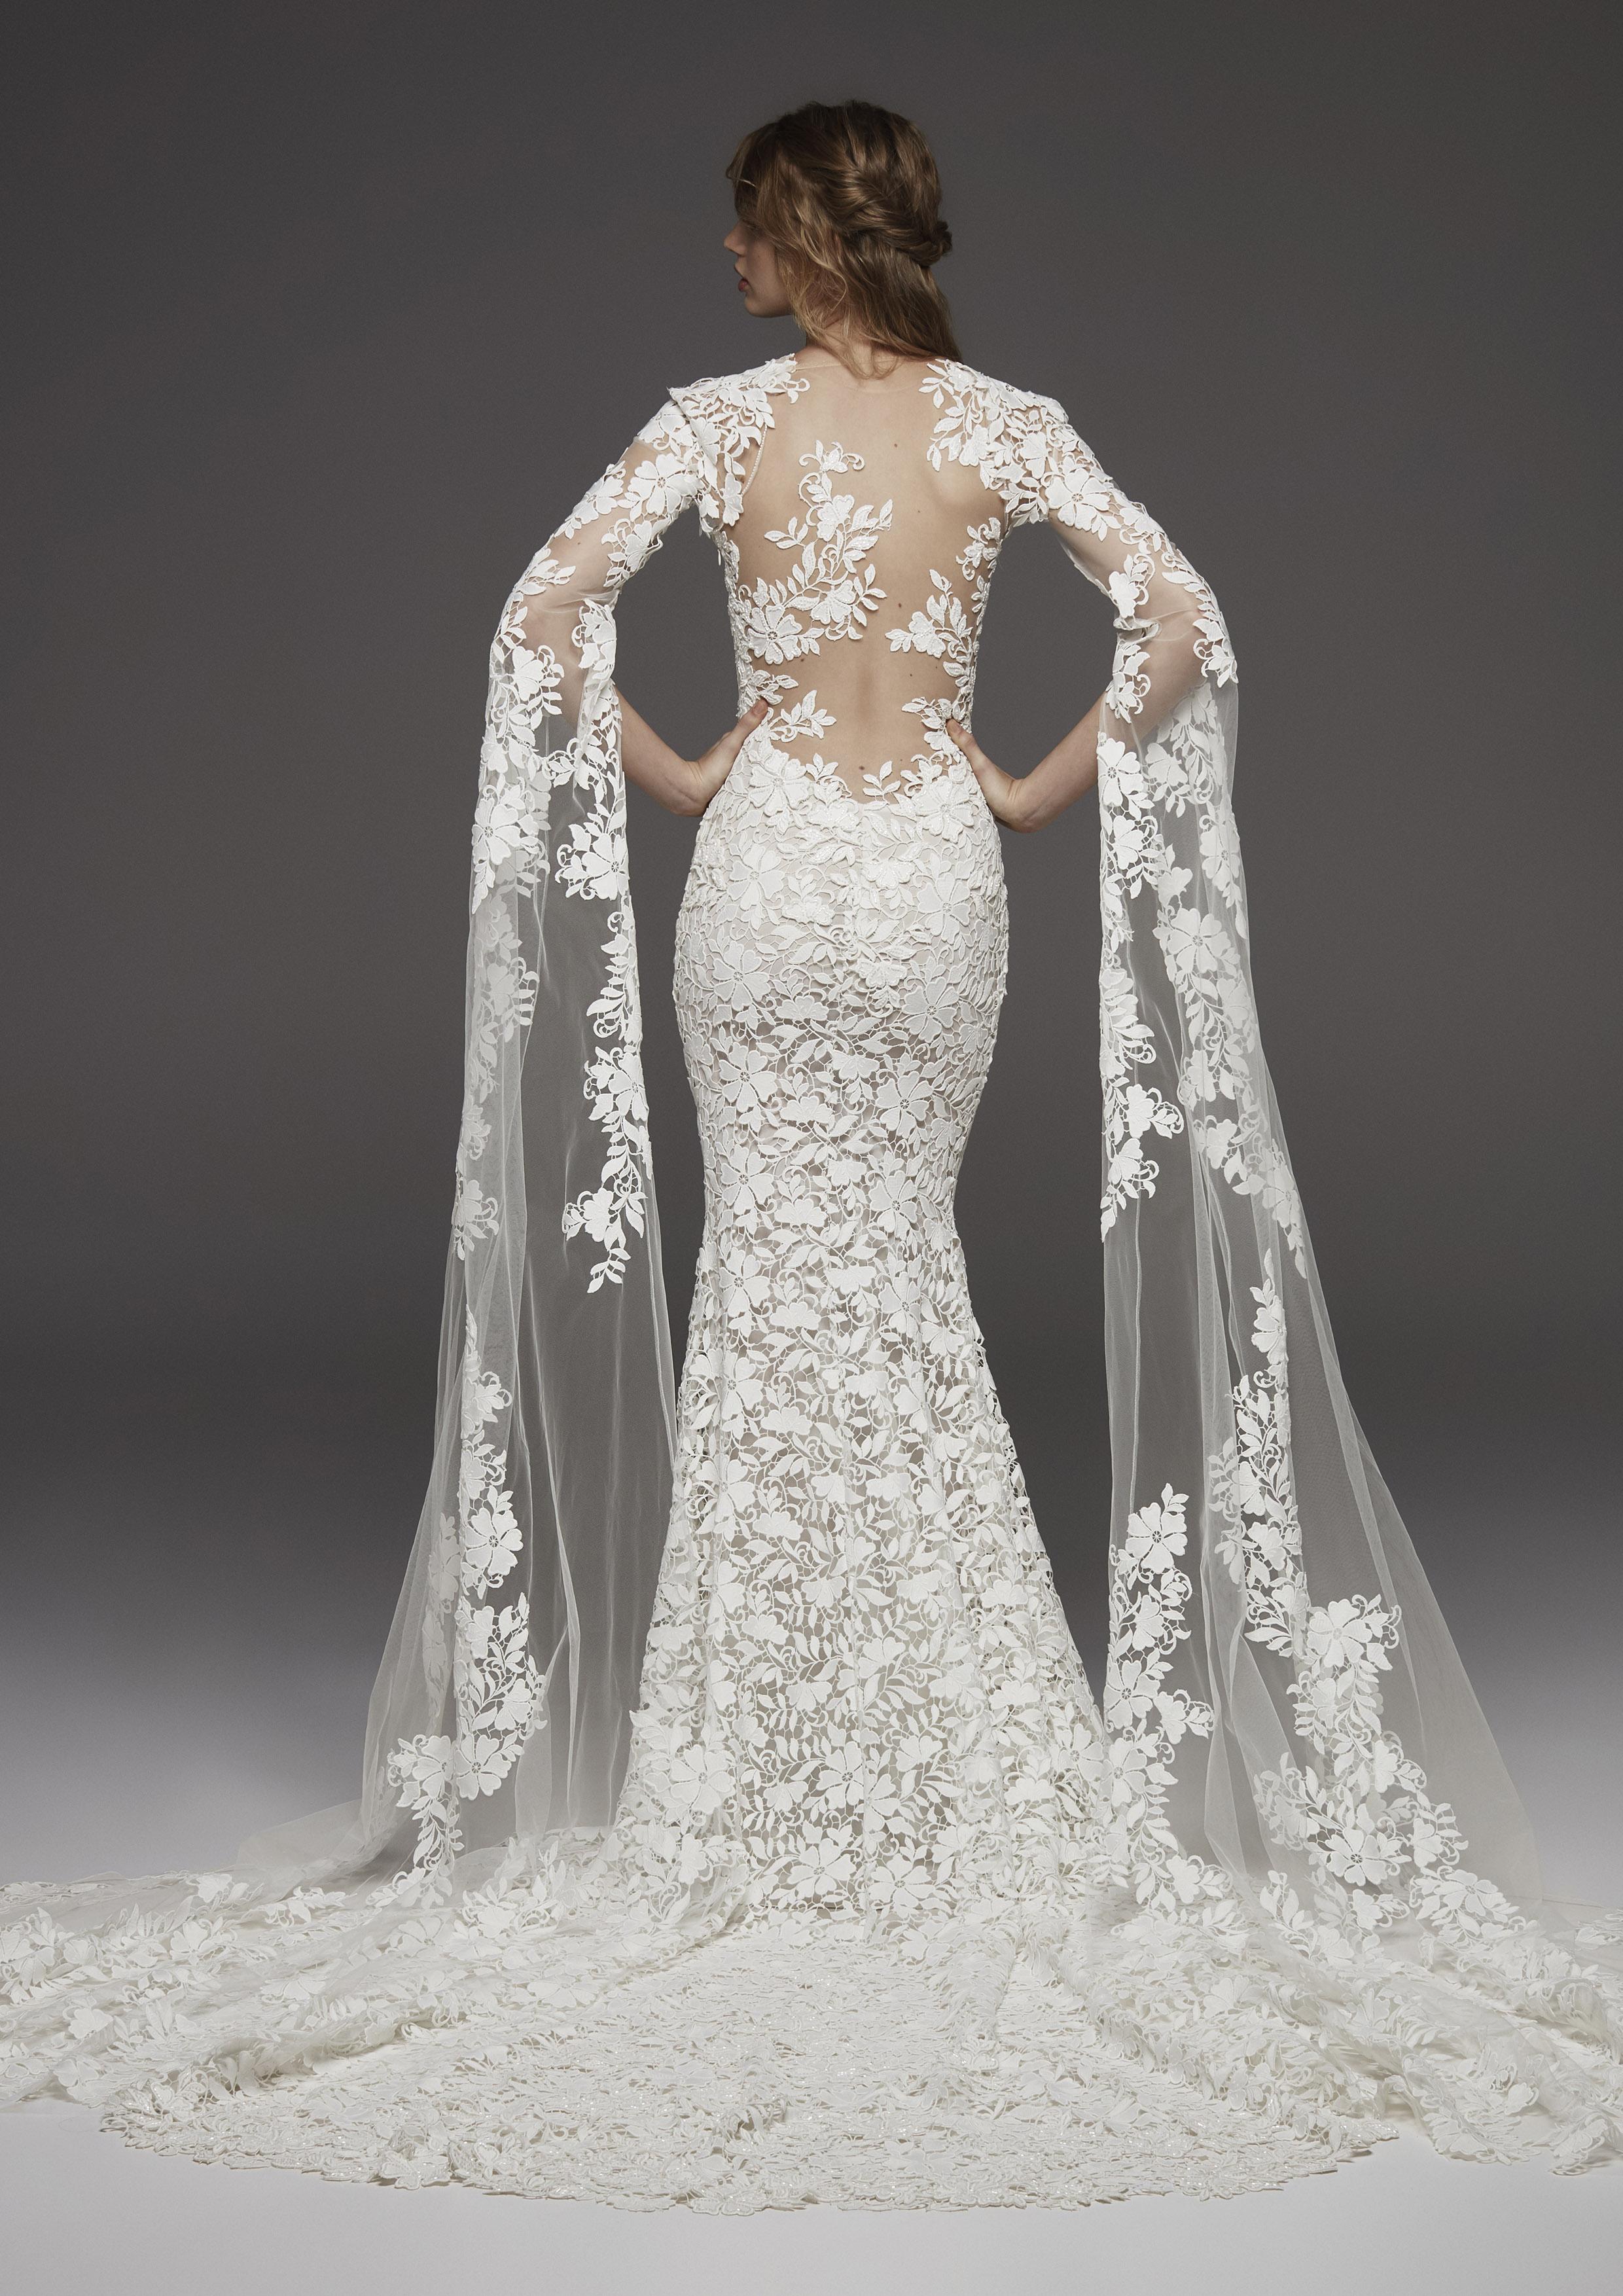 Communication on this topic: Atelier Pronovias 2019 Wedding Dress Collection, atelier-pronovias-2019-wedding-dress-collection/